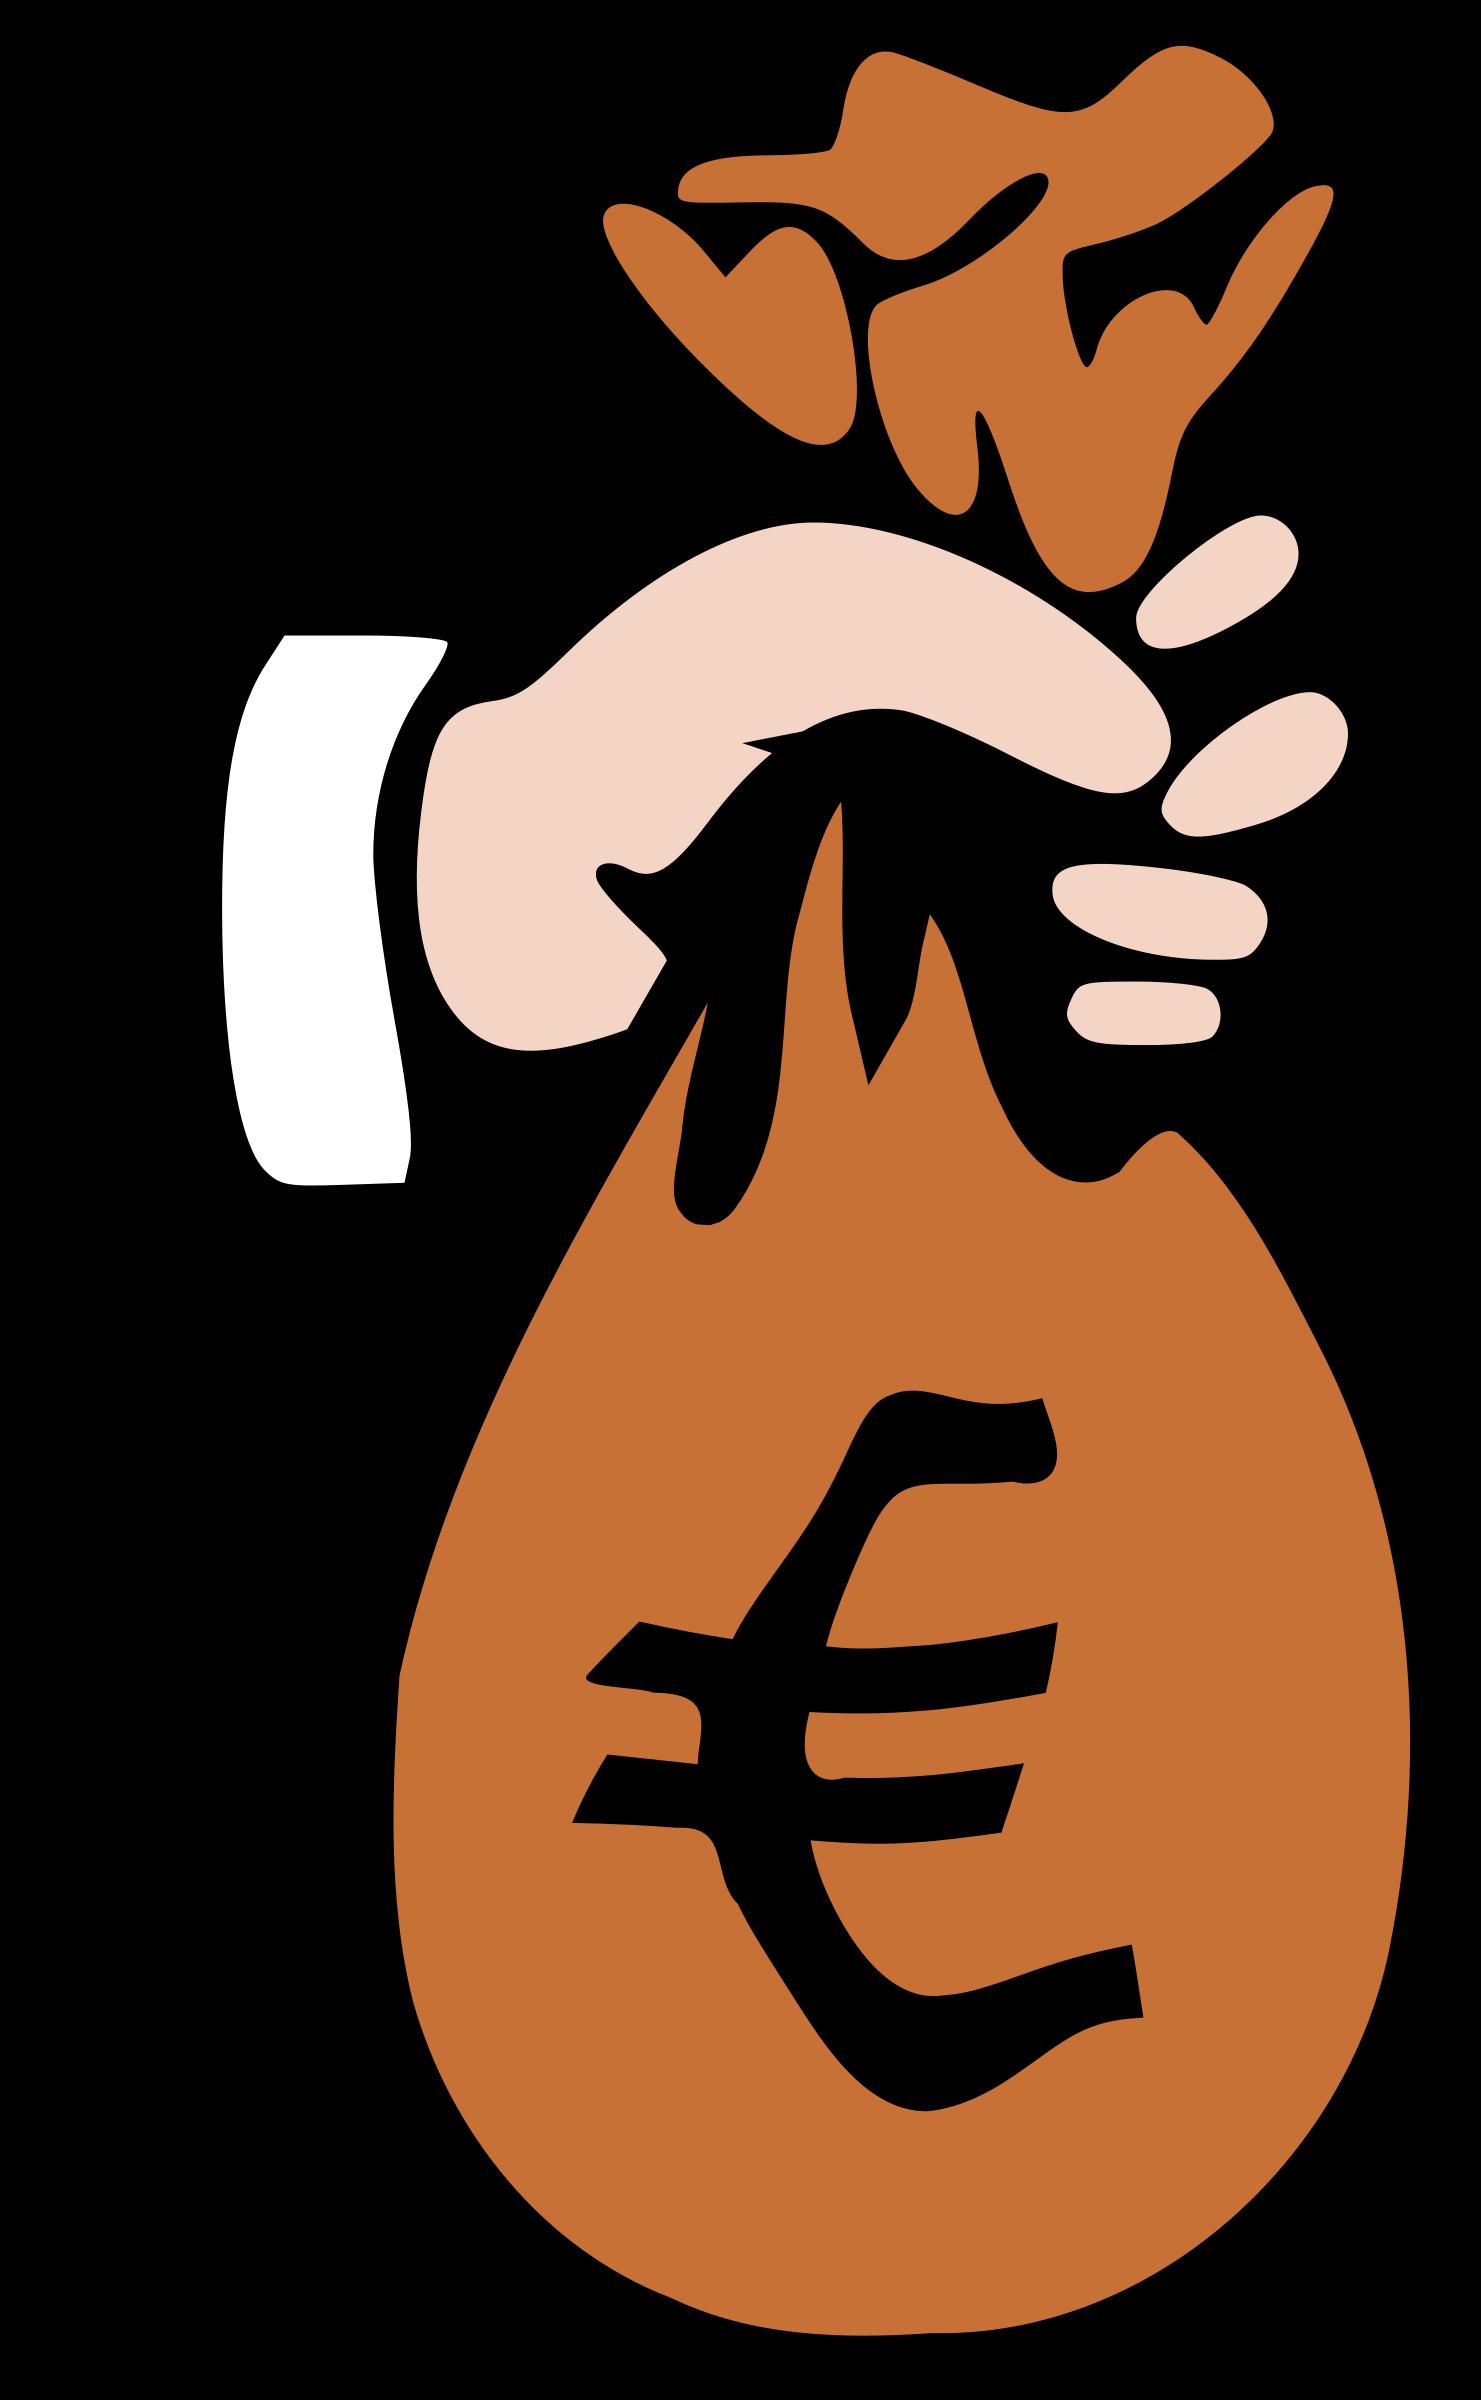 Clipart money math. Sac euro big image